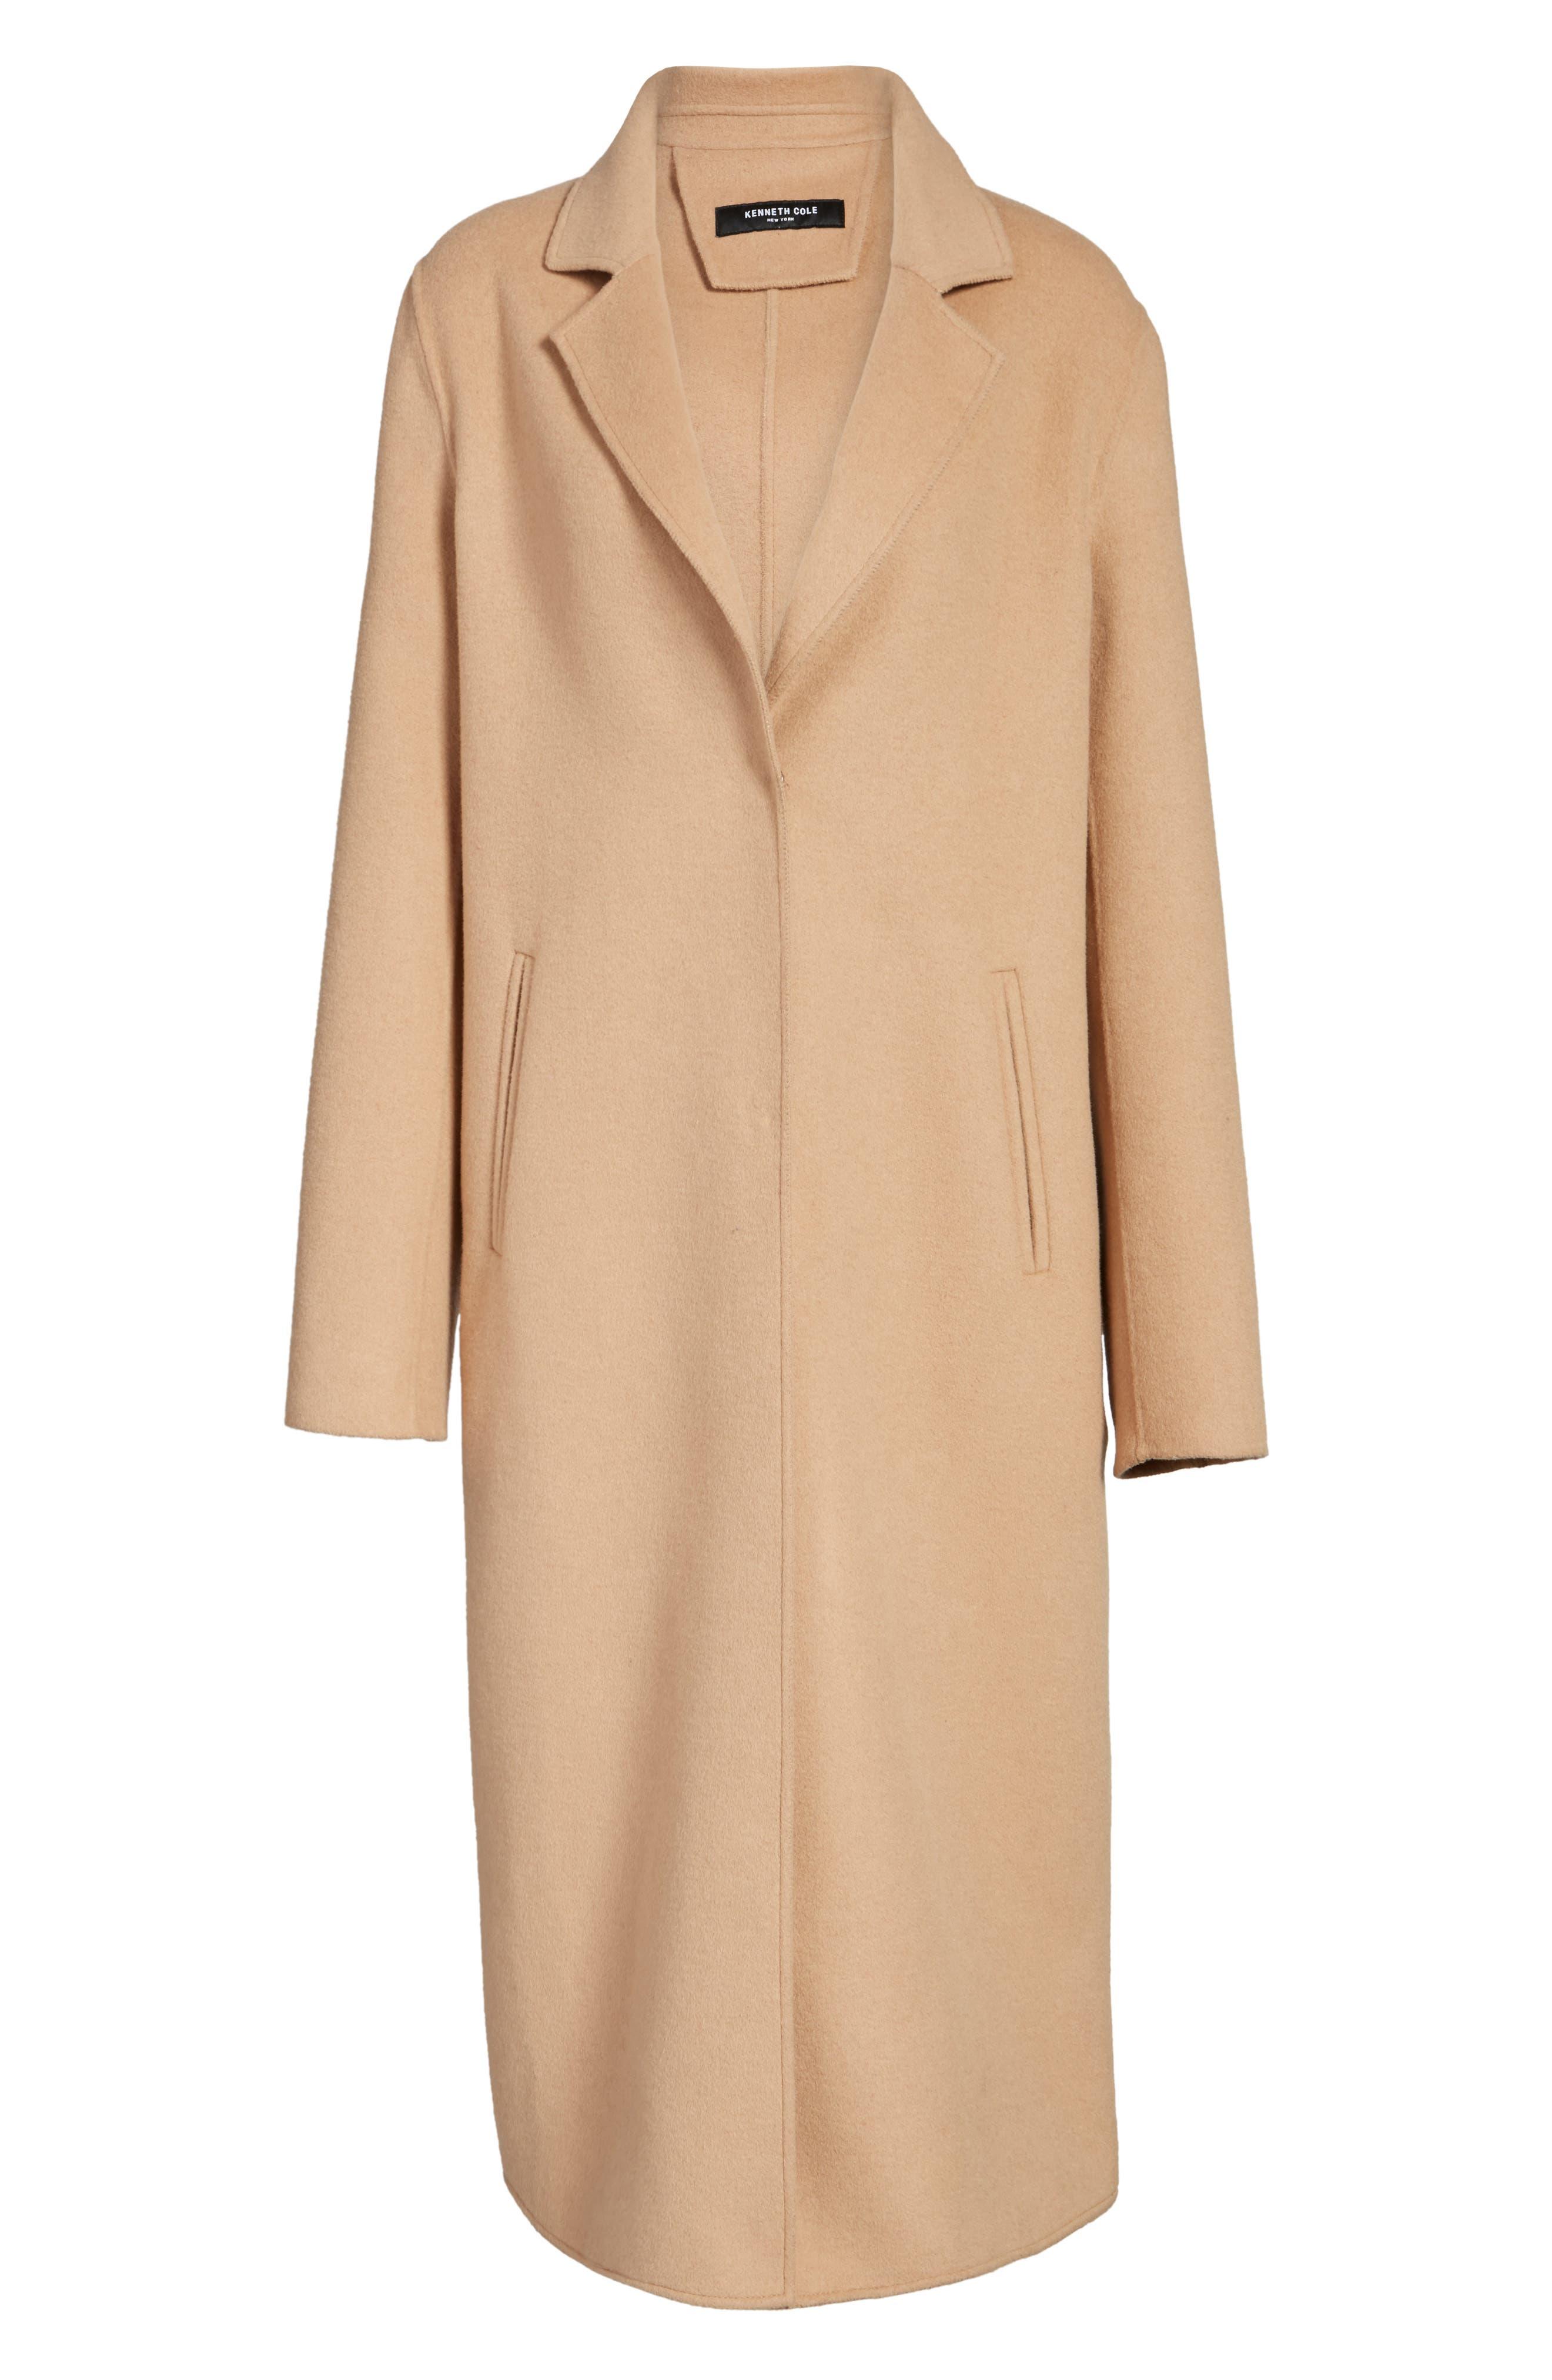 Double Face Wool Blend Long Coat,                             Alternate thumbnail 6, color,                             Camel